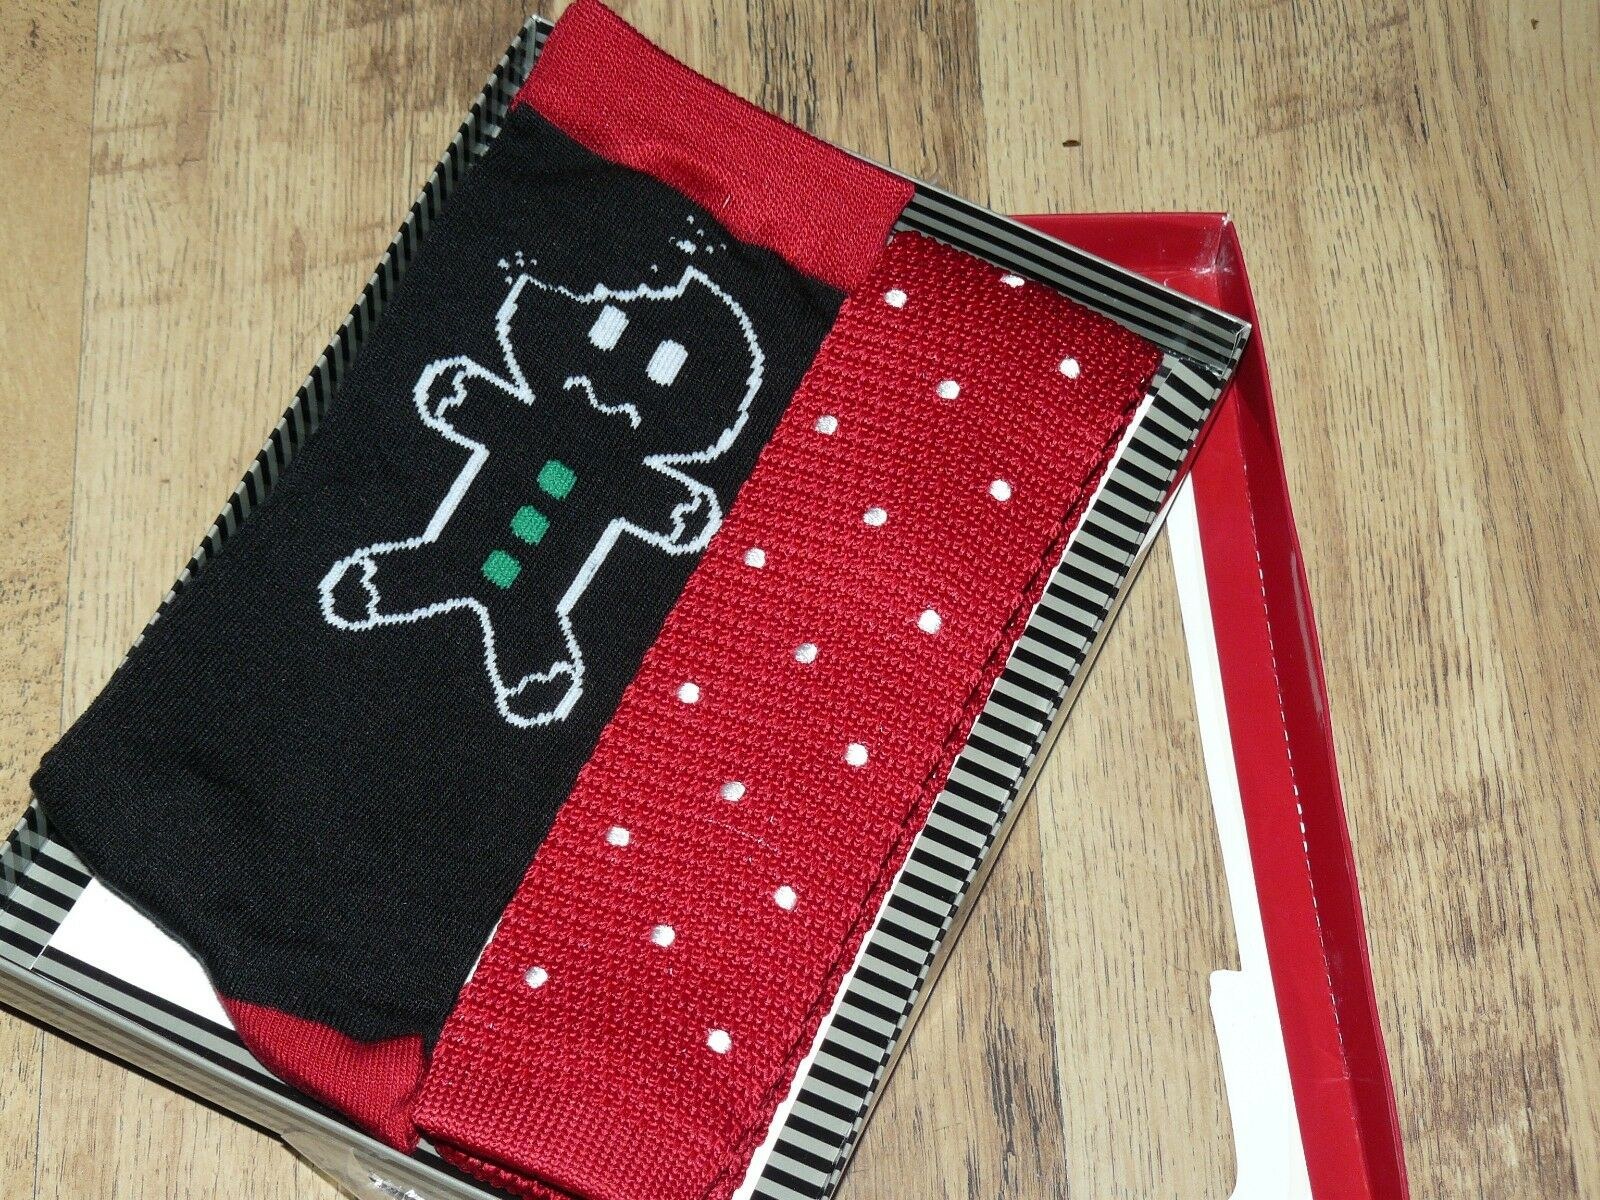 Mens Novelty Christmas Bah humbug Themed Crew Socks and Tie Set New